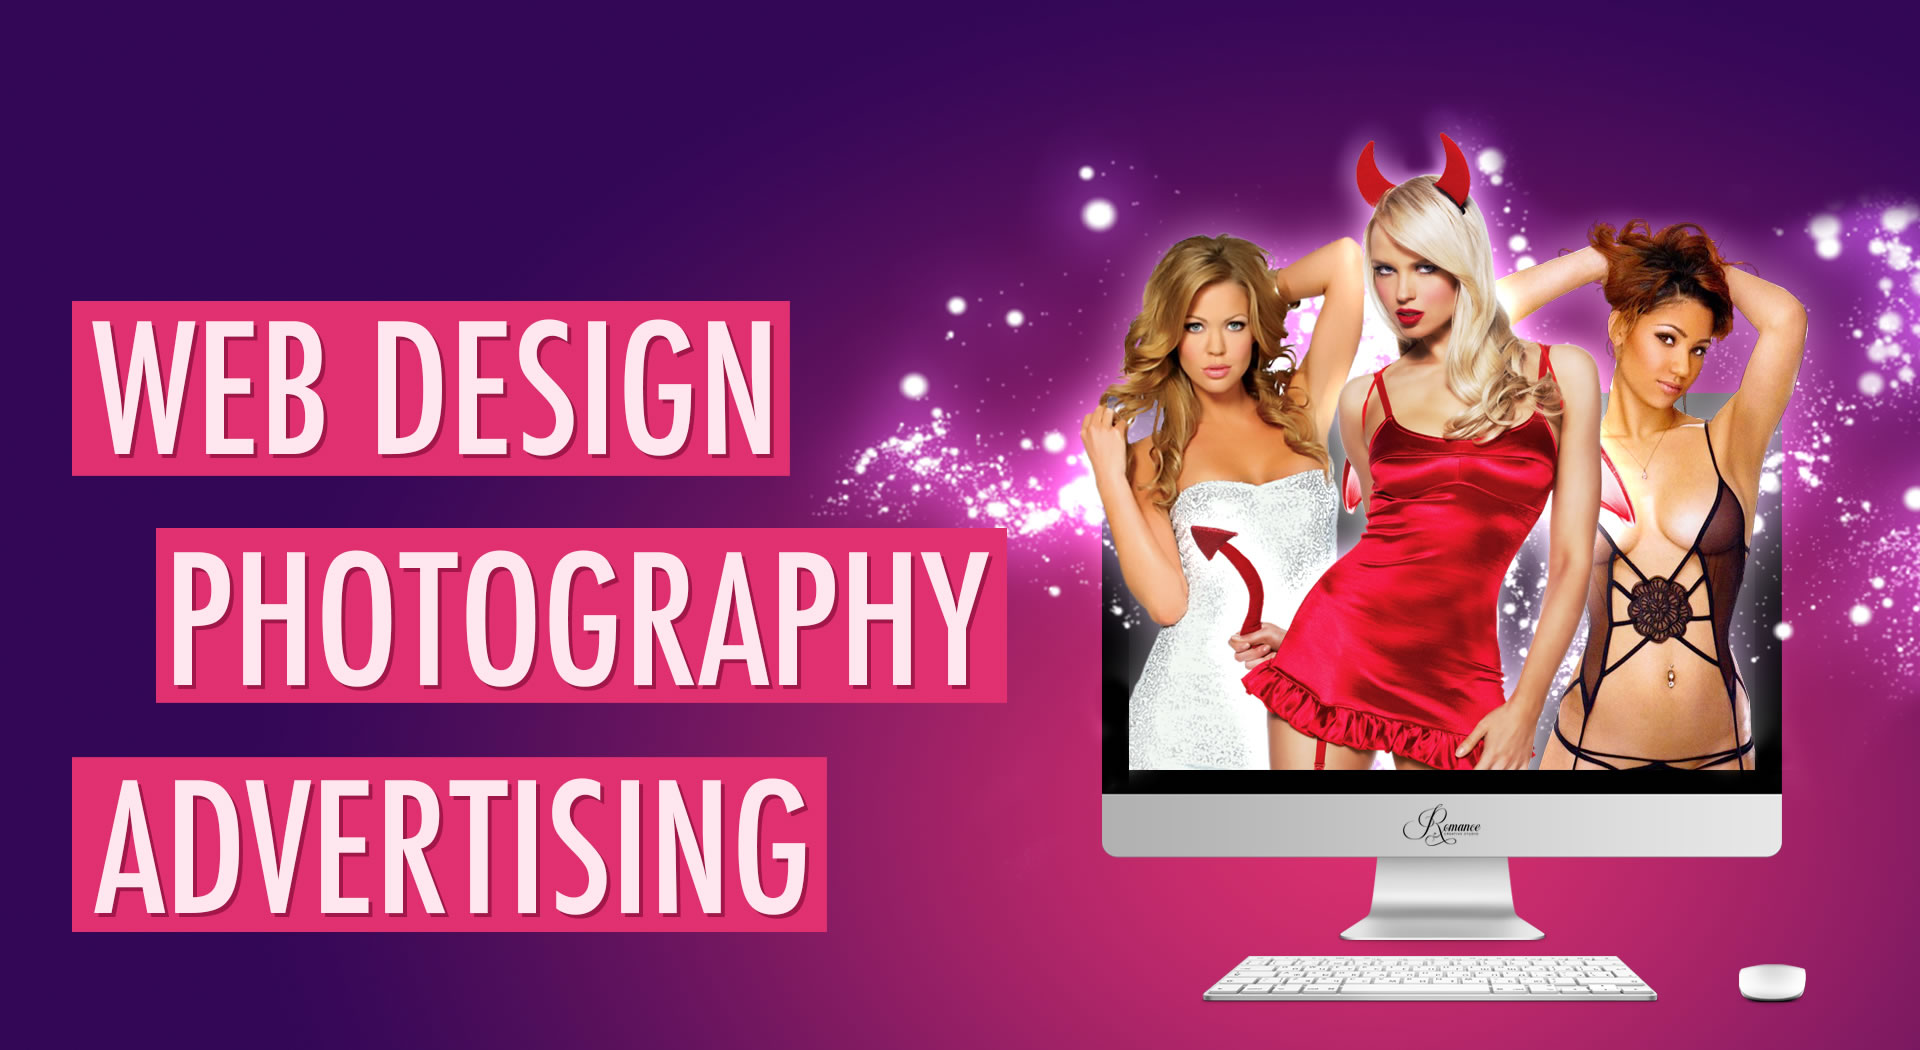 romance-london-escort-web-design-photography